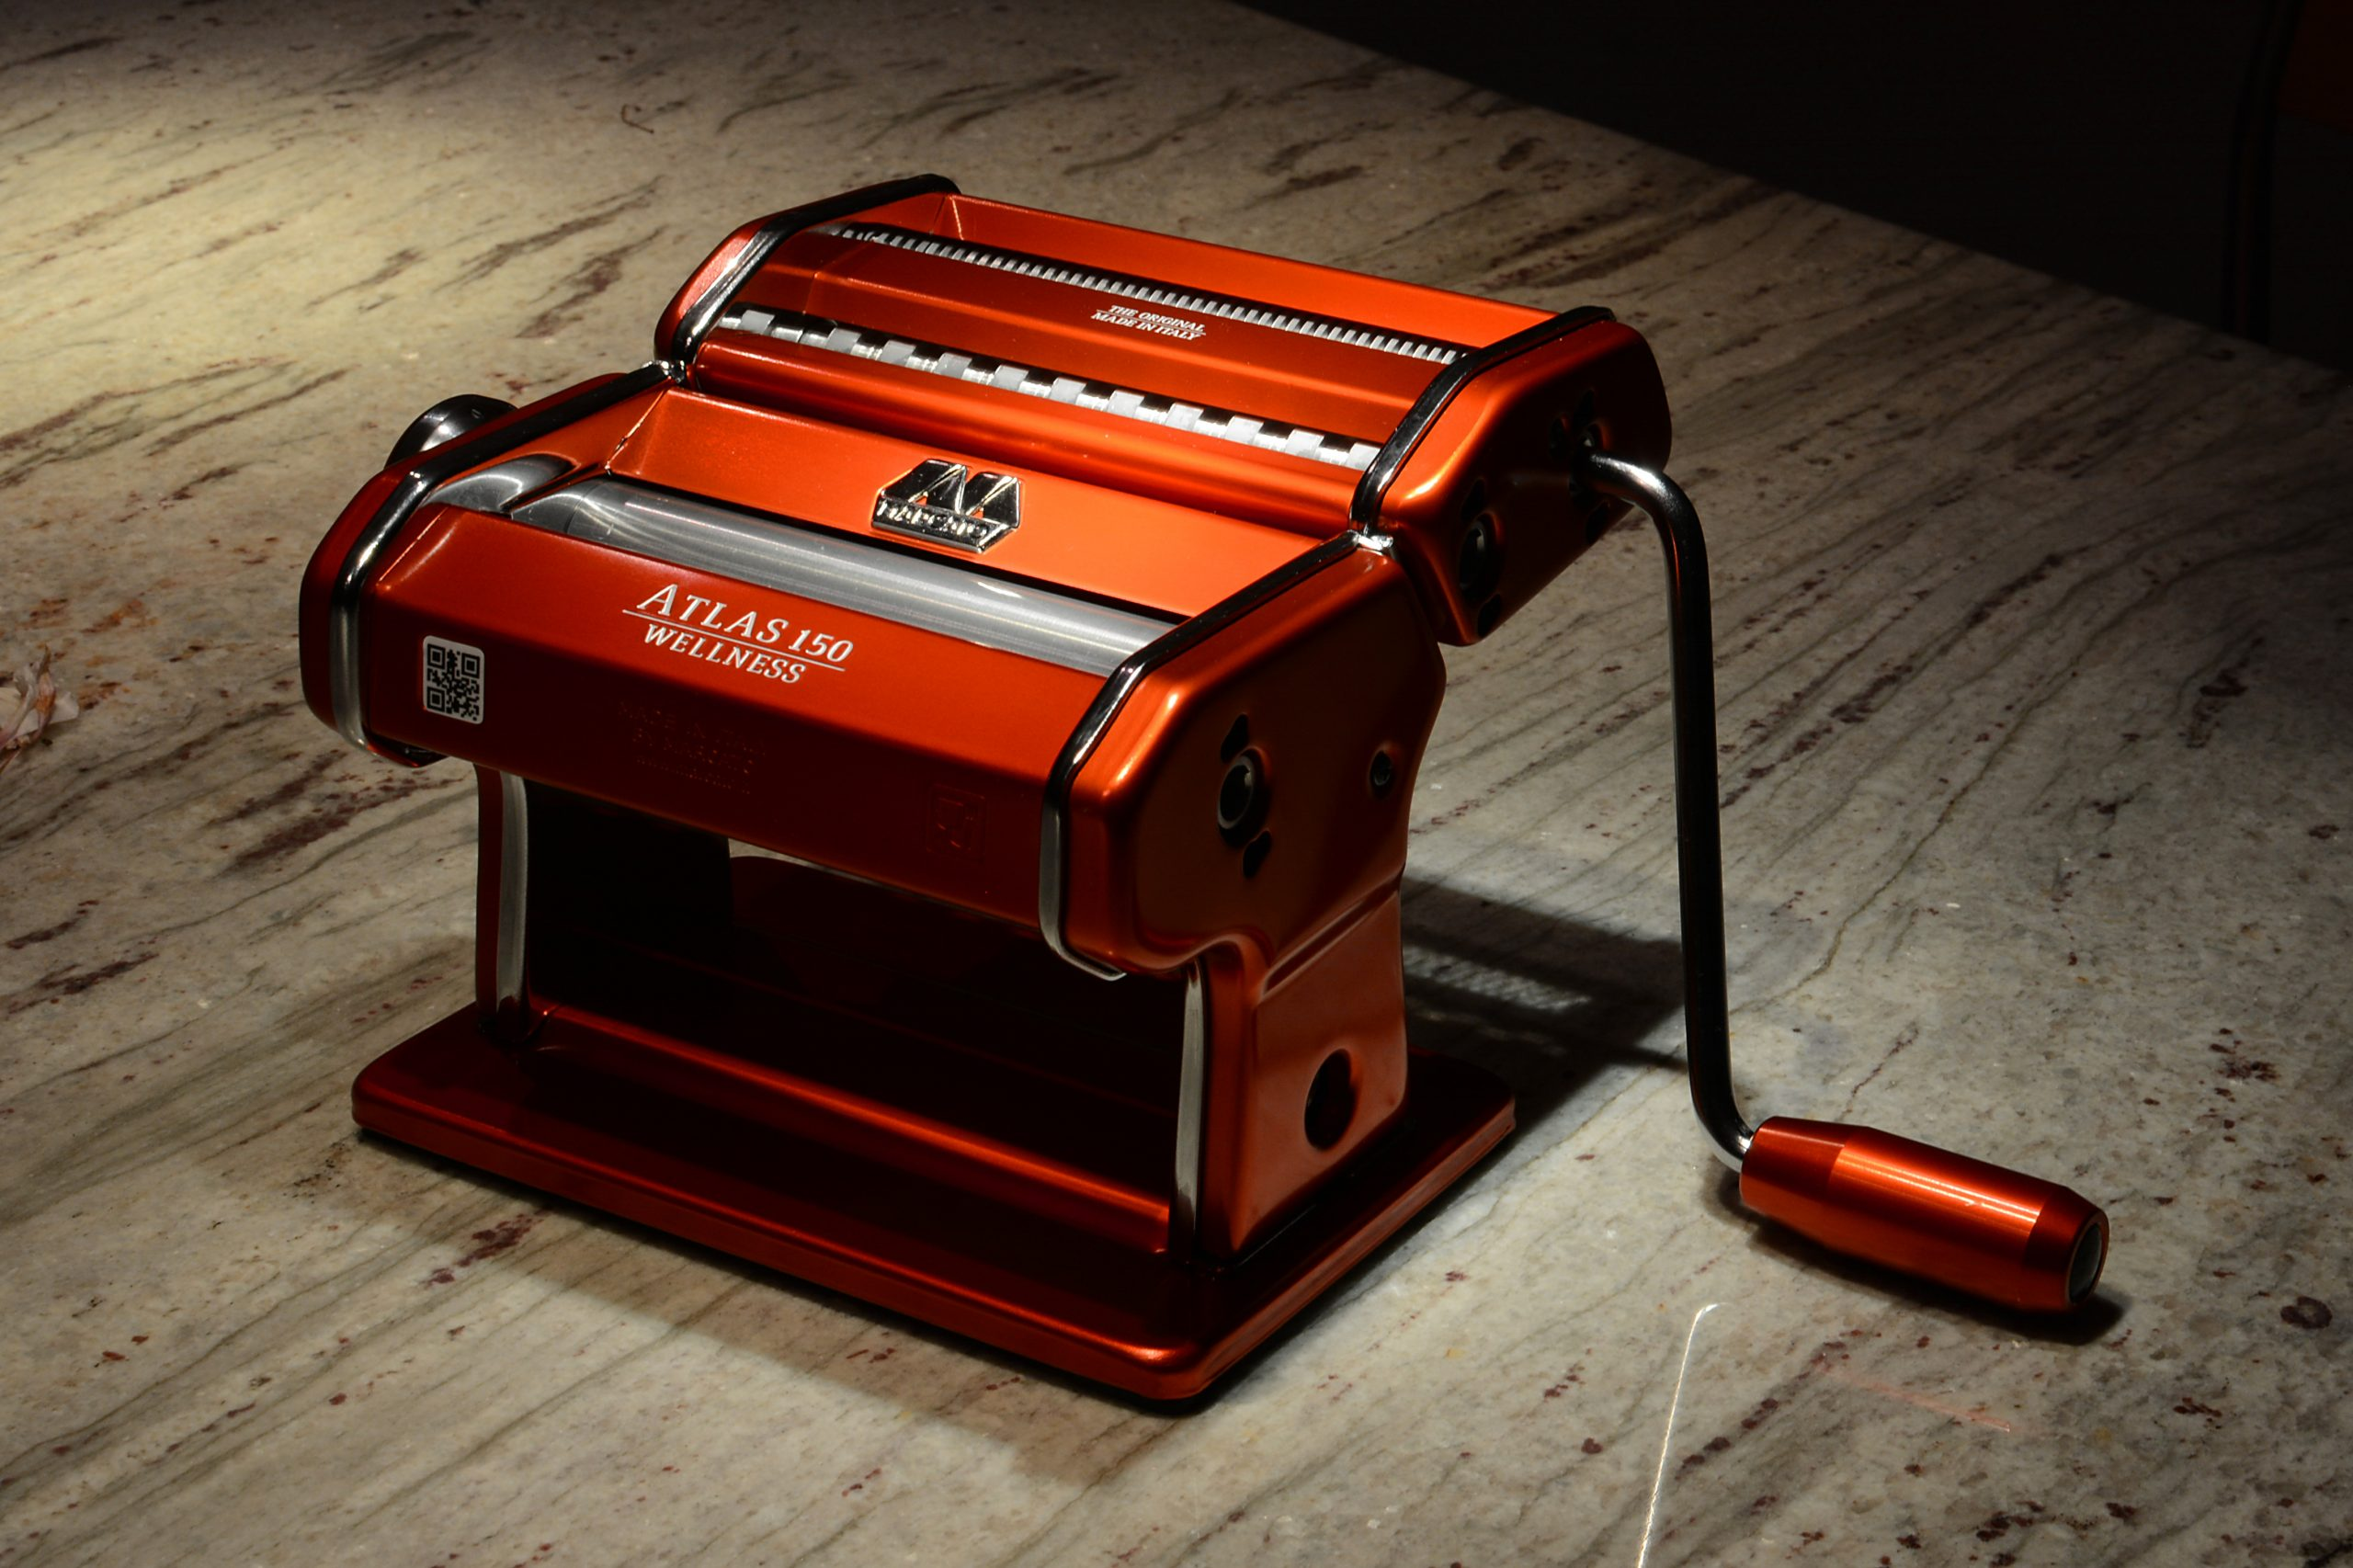 Nudelmaschine Marcato Atlas 150 – Pasta selber machen